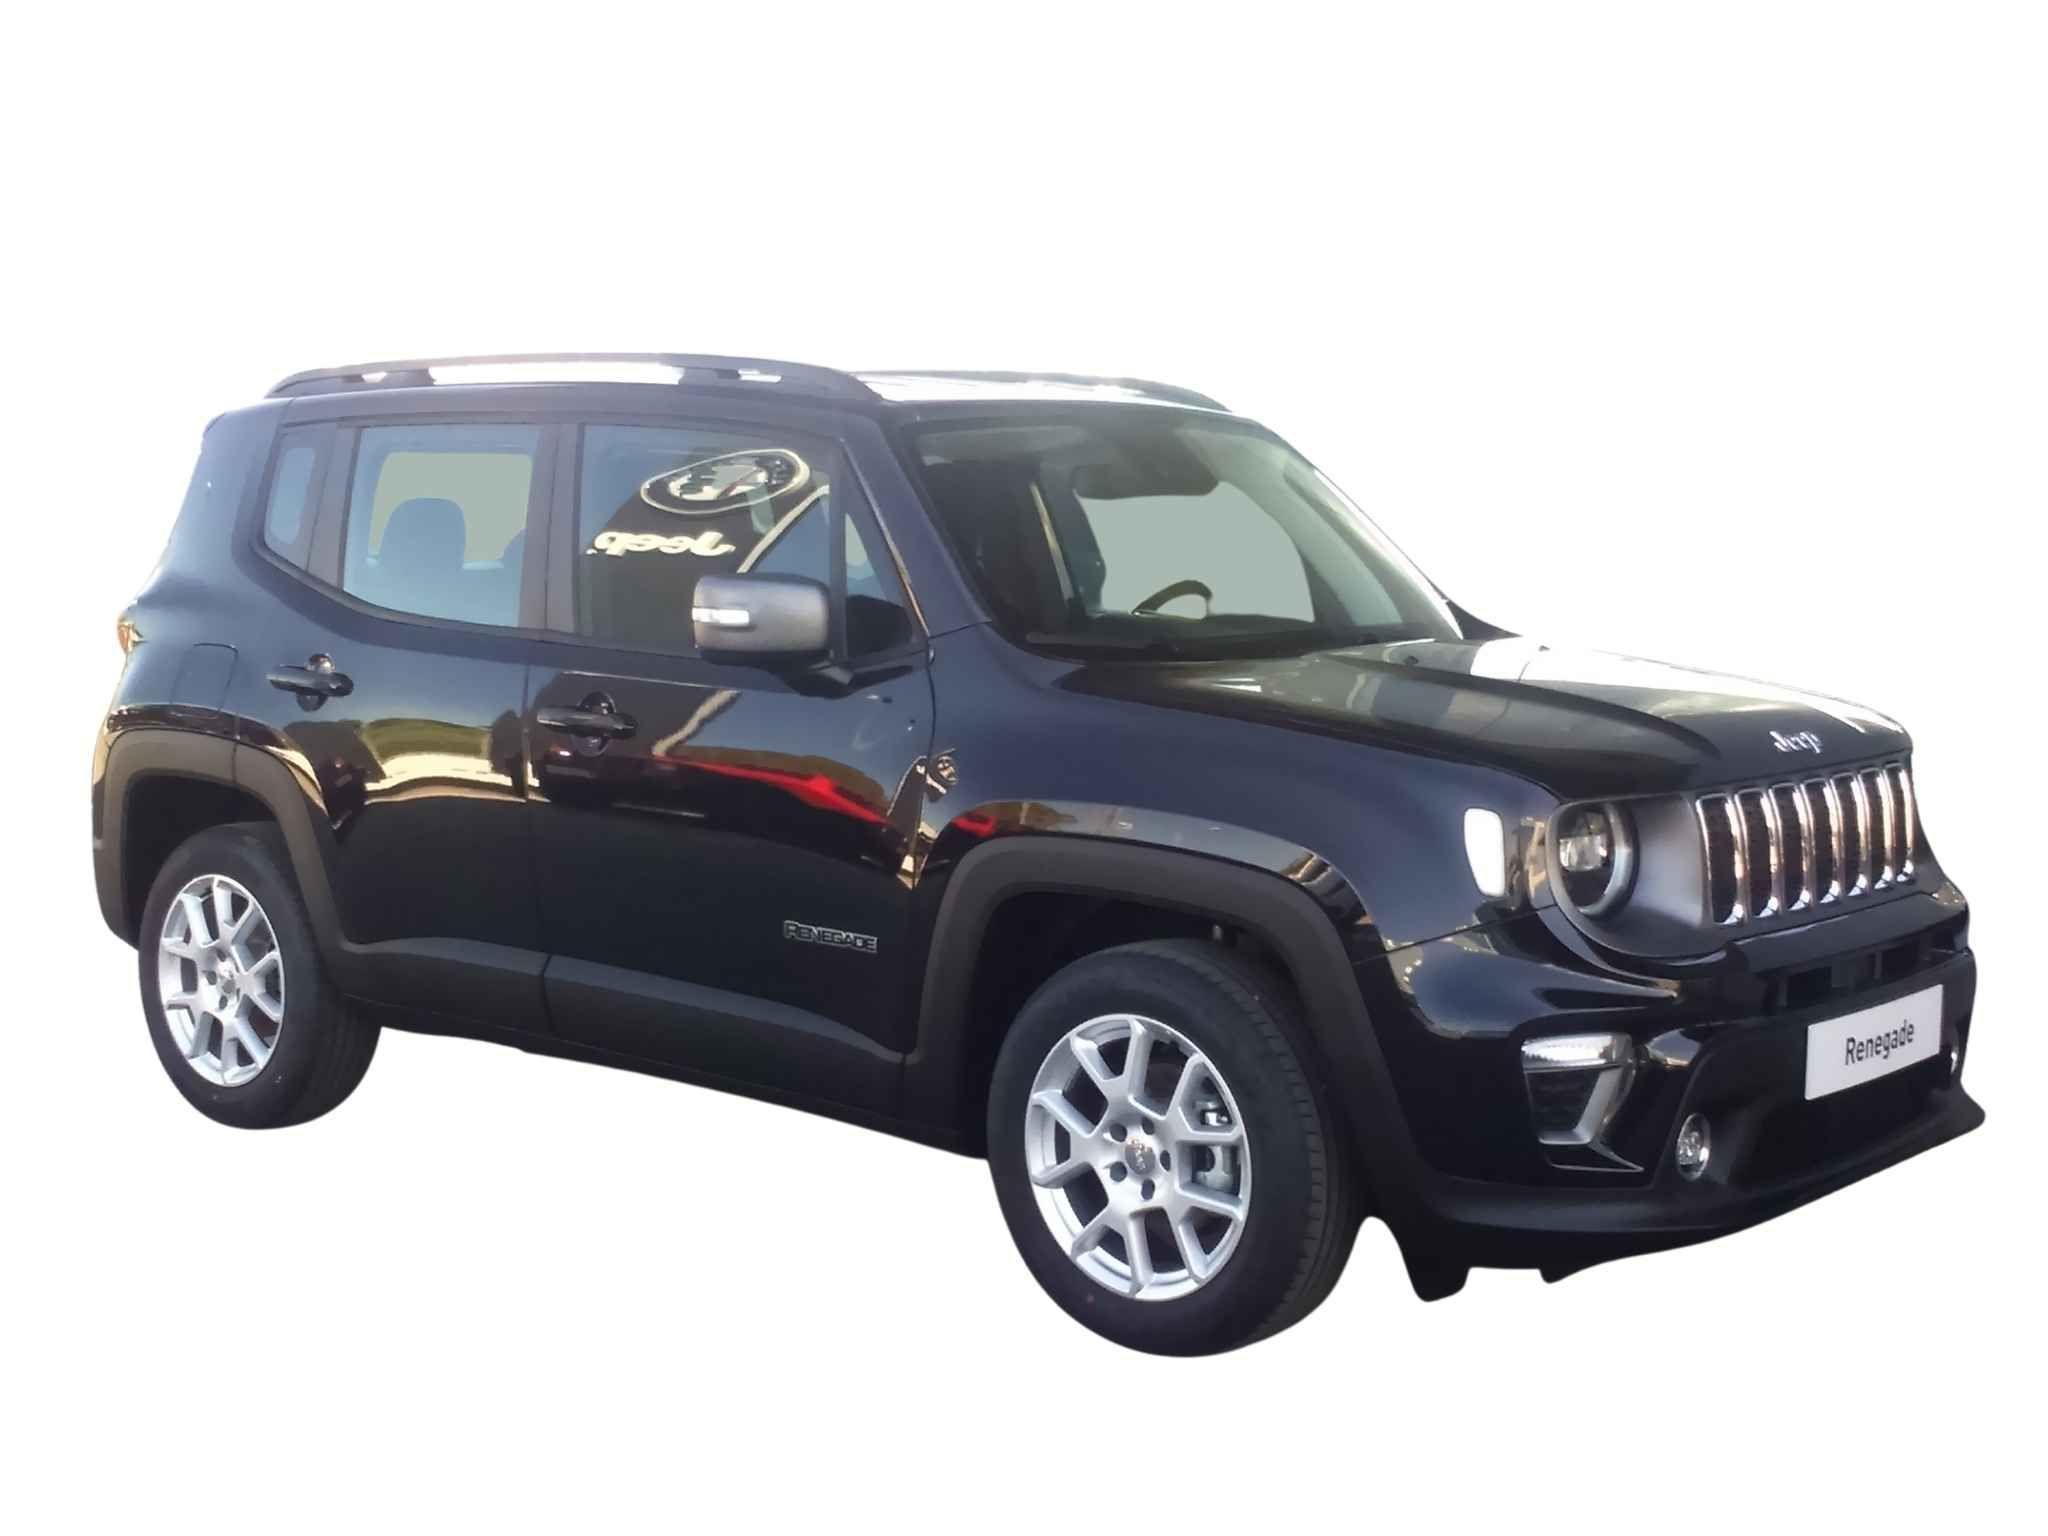 Jeep Renegade MY21 Limited II 1.0G 120CV 4x2 gasolina de km0 en color negro